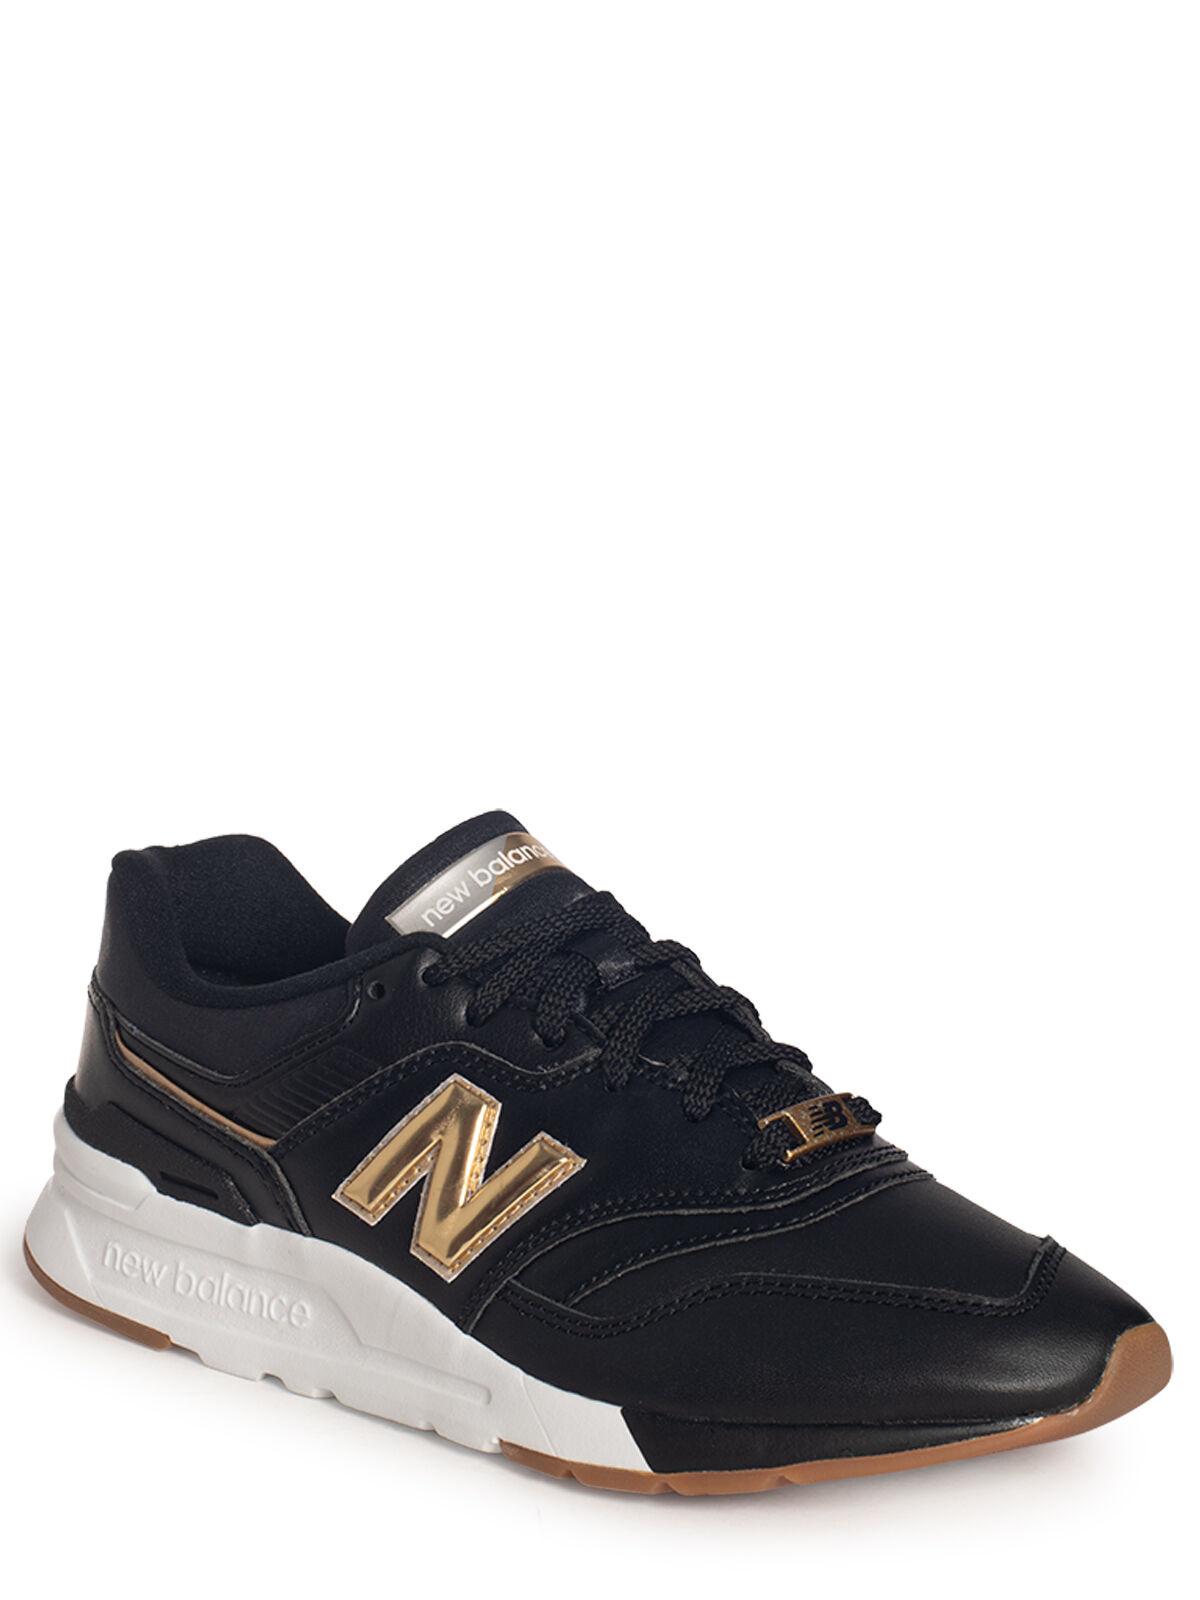 New Balance Sneaker CW997HAI schwarz